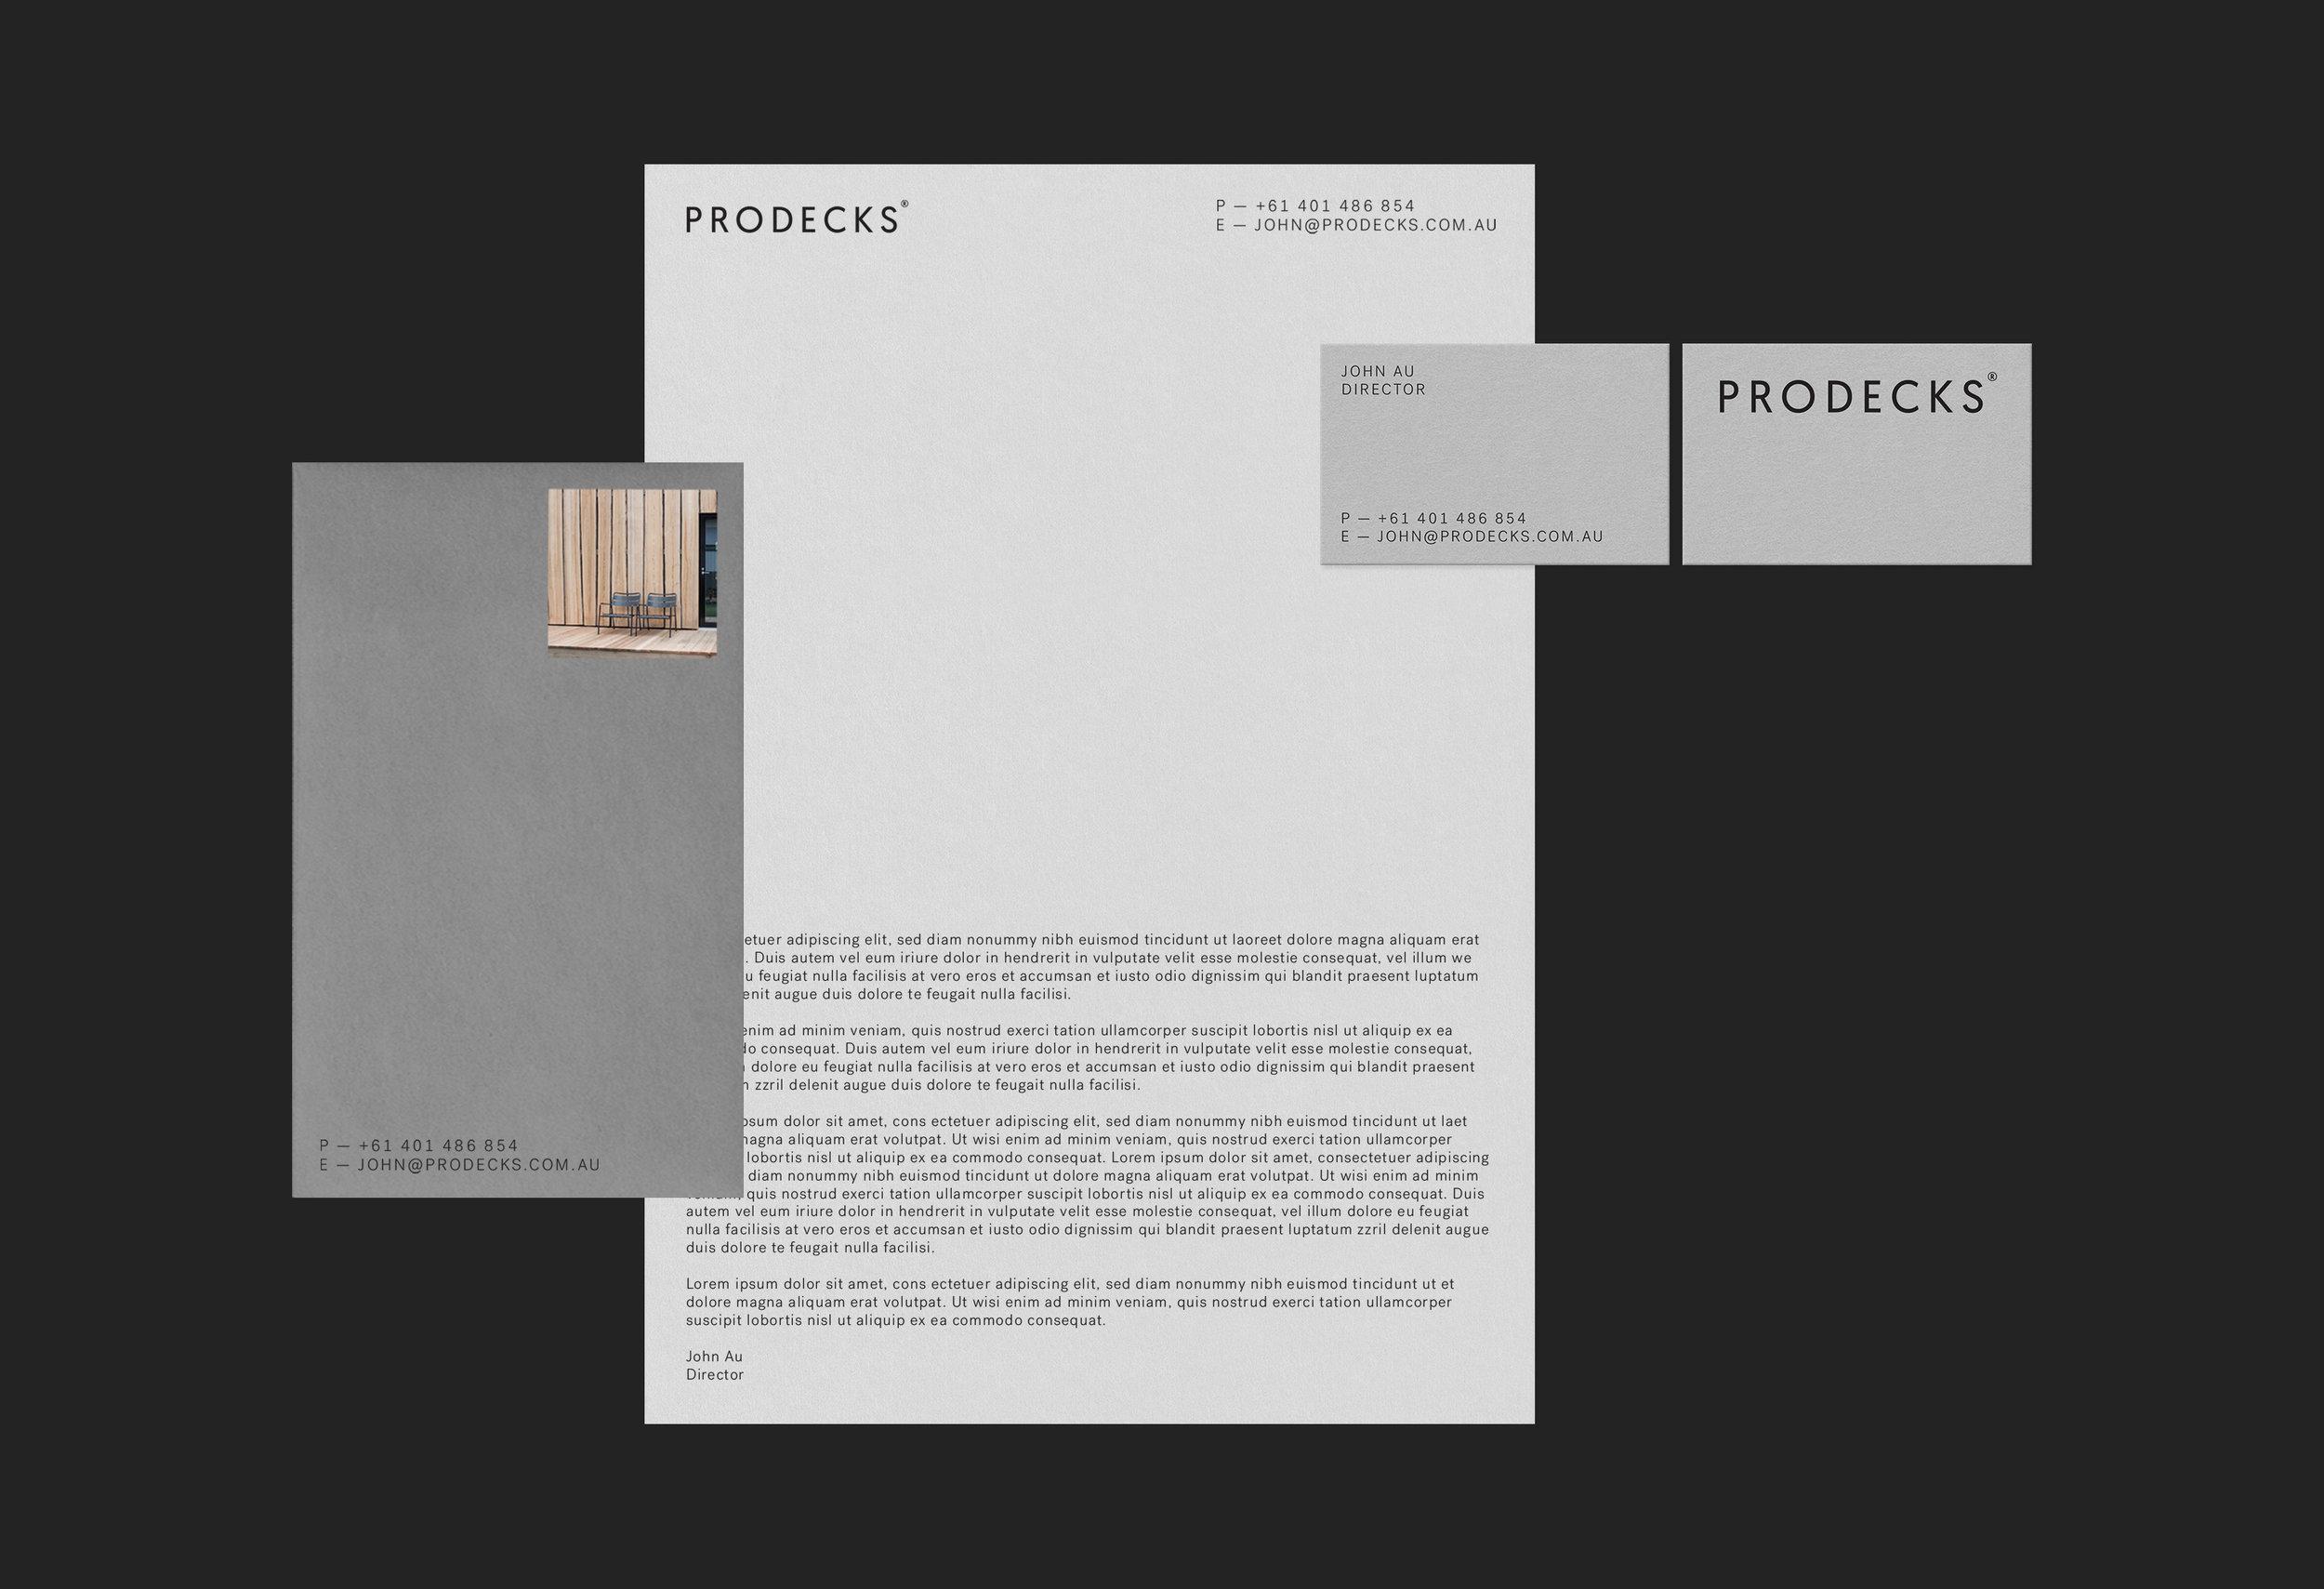 2_Stationary_Prodecks.jpg